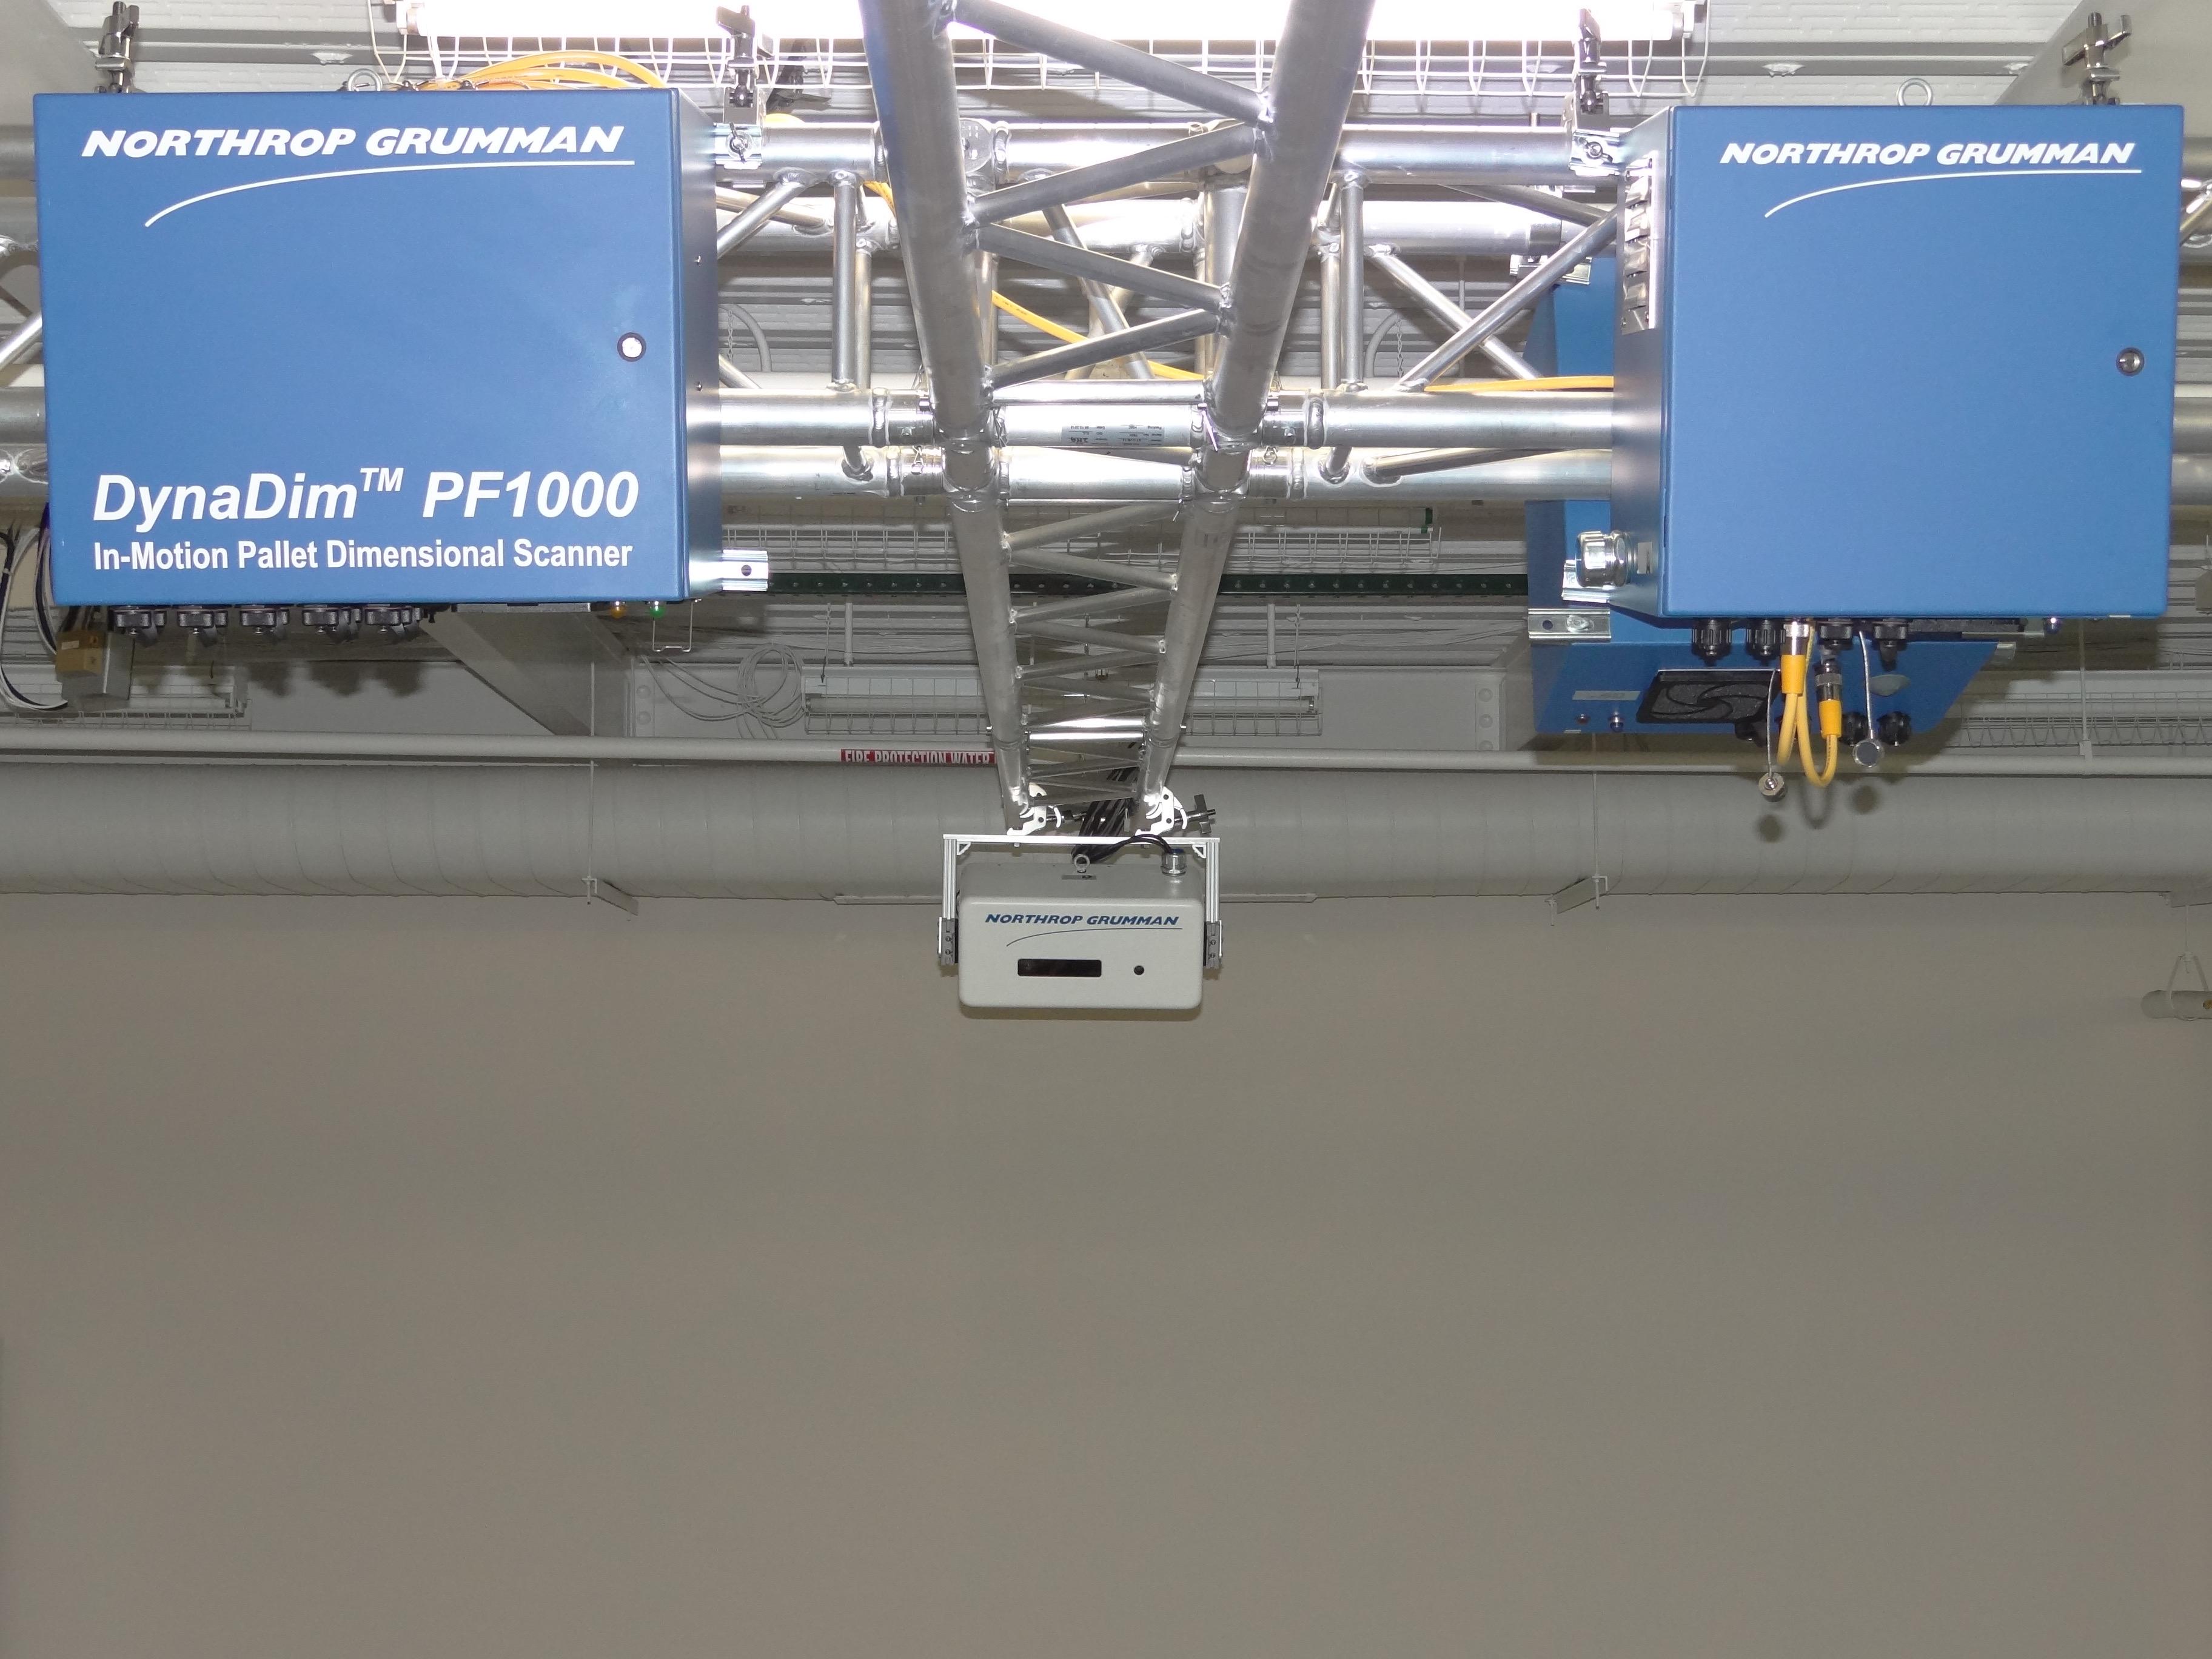 Northrop Grumman Dynadimtm In Motion Pallet Dimensioner Receives